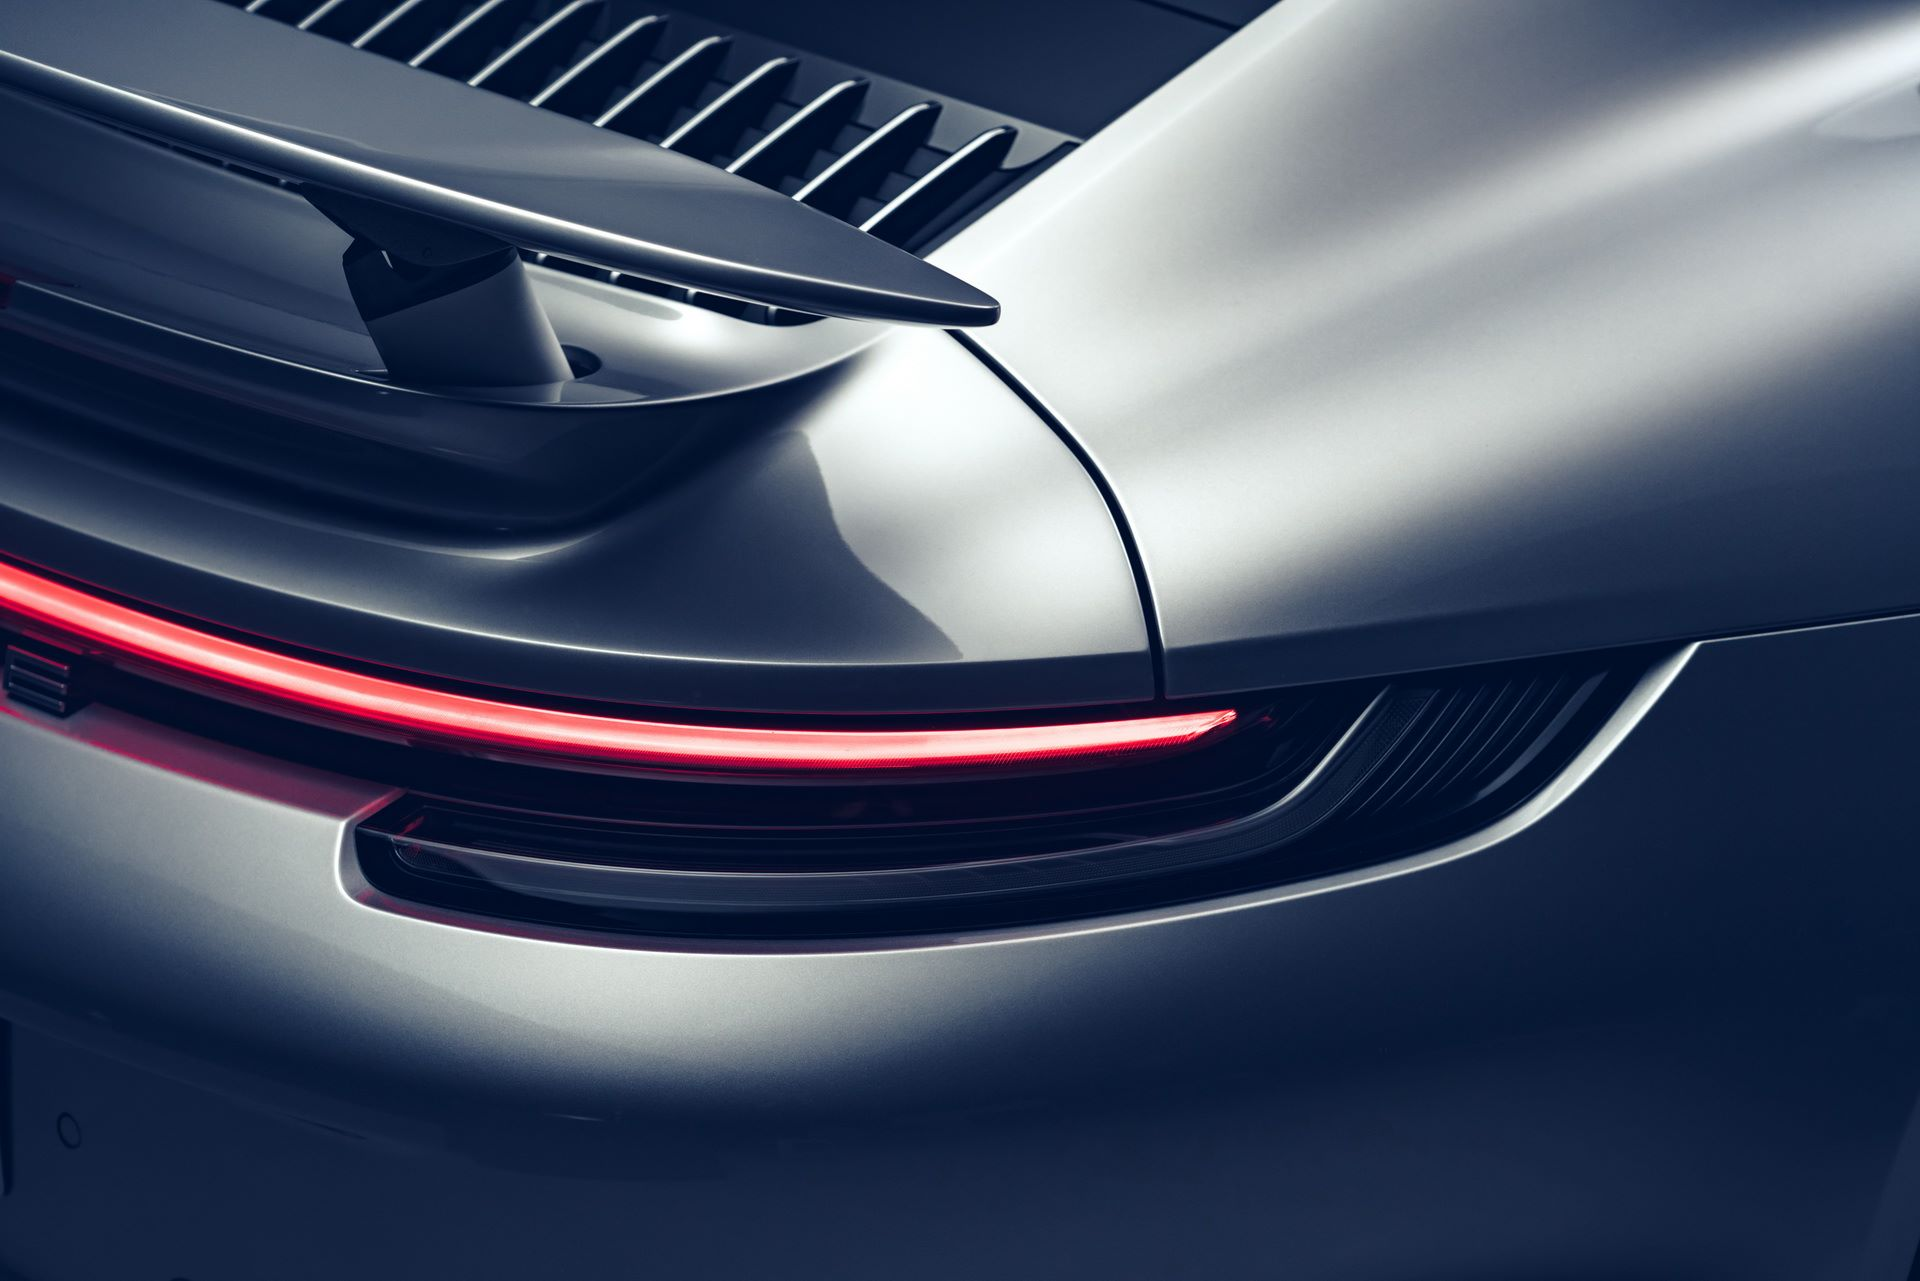 Porsche-911-Turbo-S-2020-56